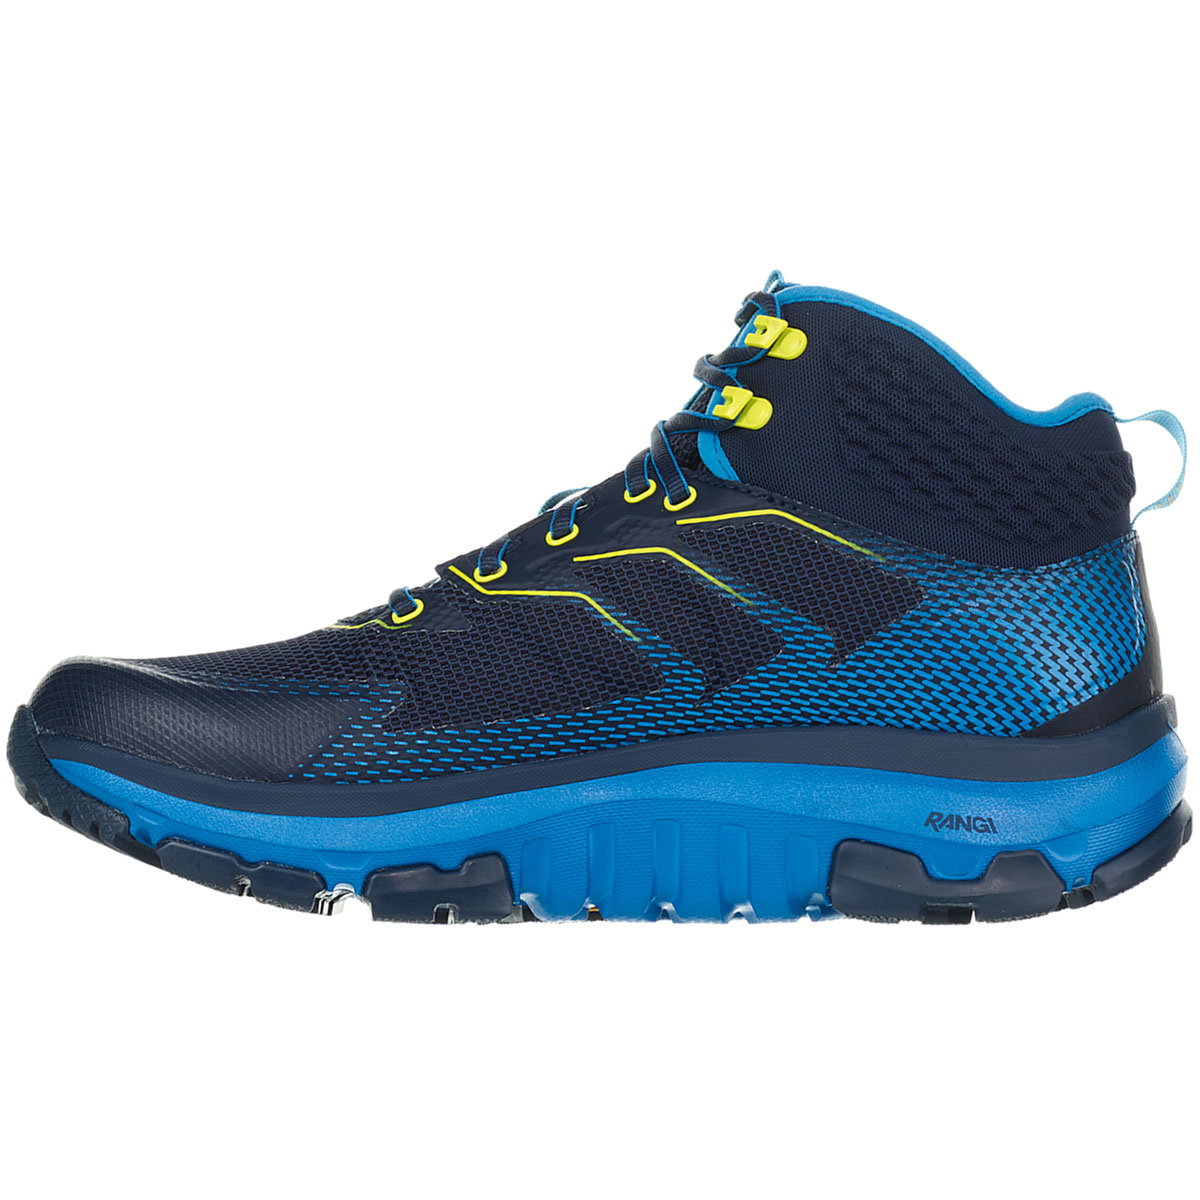 Men's Hoka One One Sky Toa Gore-Tex Trail Running Shoe - Color: Black Iris/Blue - Size: 7 - Width: Regular, Black Iris/Blue, large, image 4